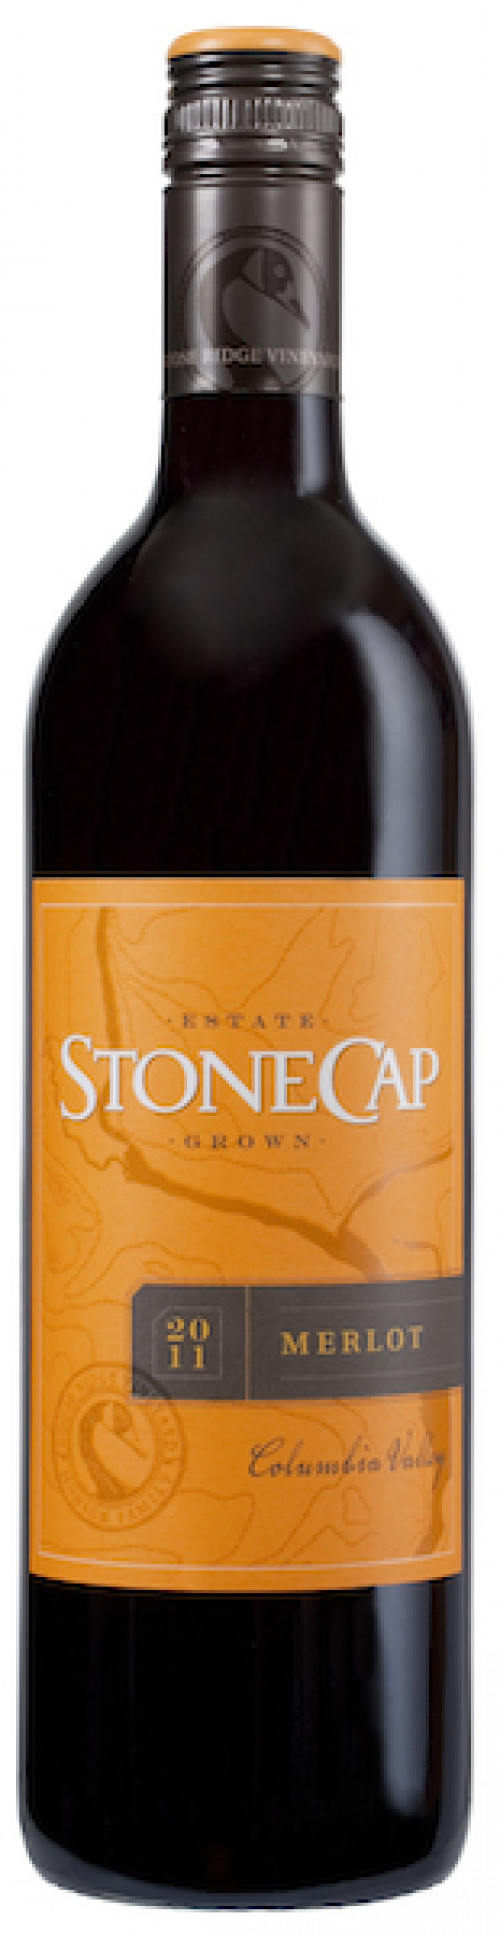 Stonecap Merlot 750Ml